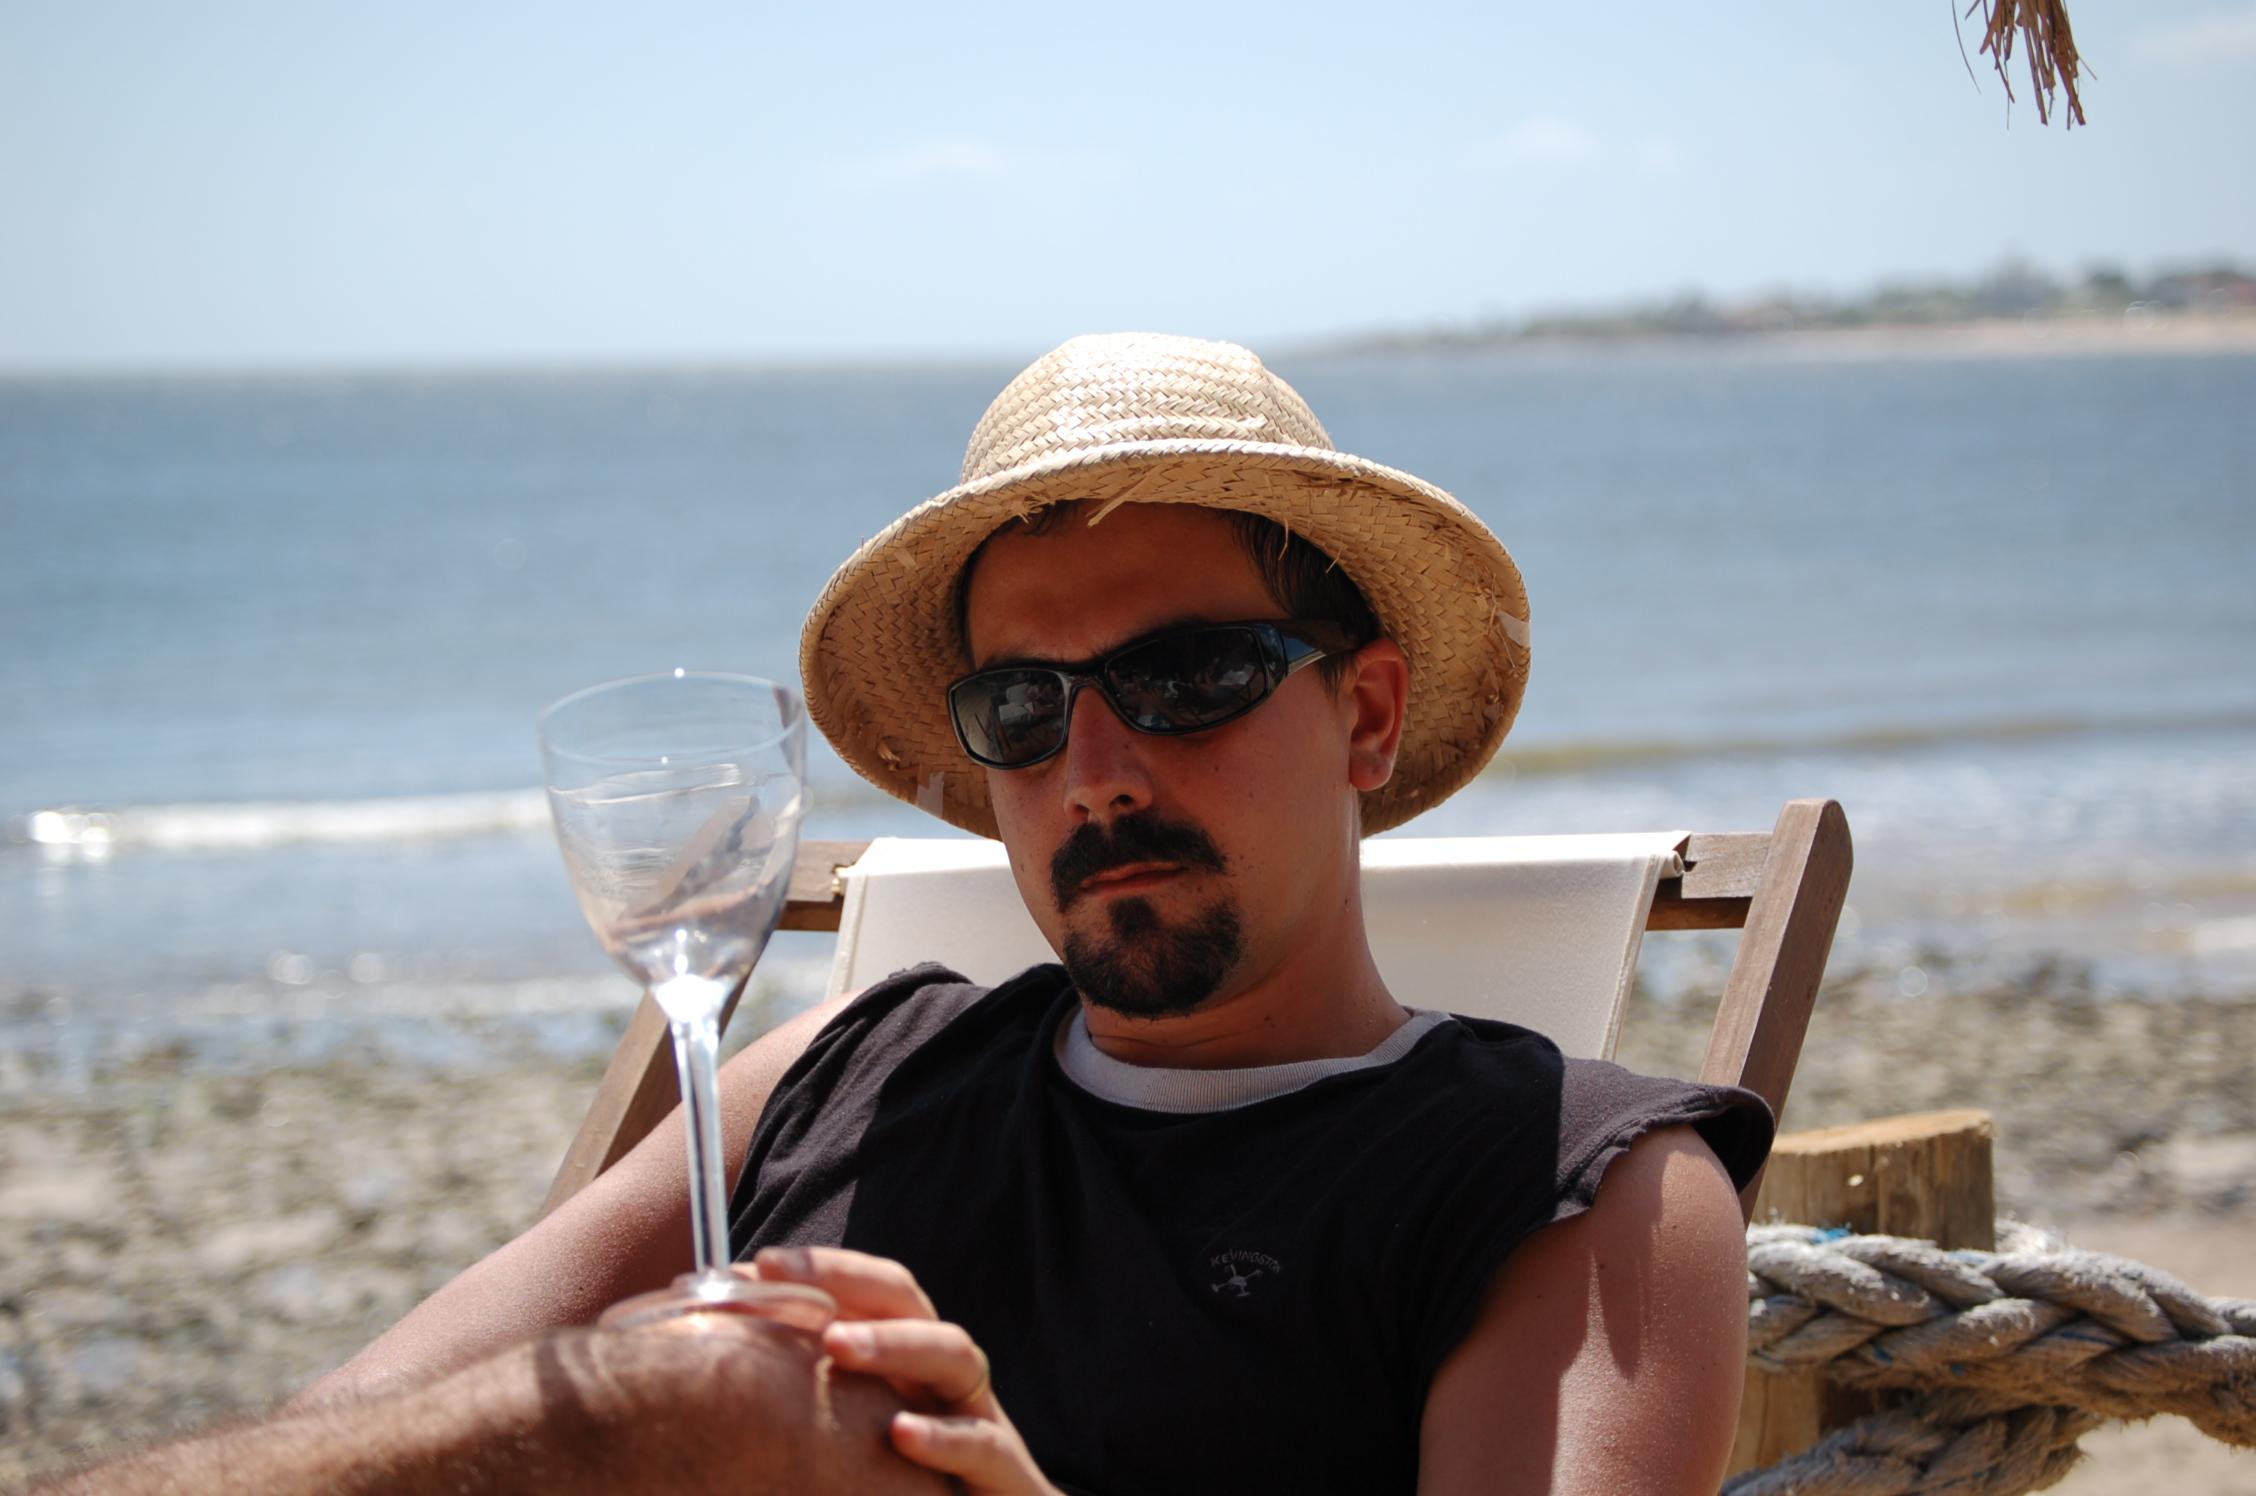 Tomás...composing...beachside in Piriapolis, Uruguay